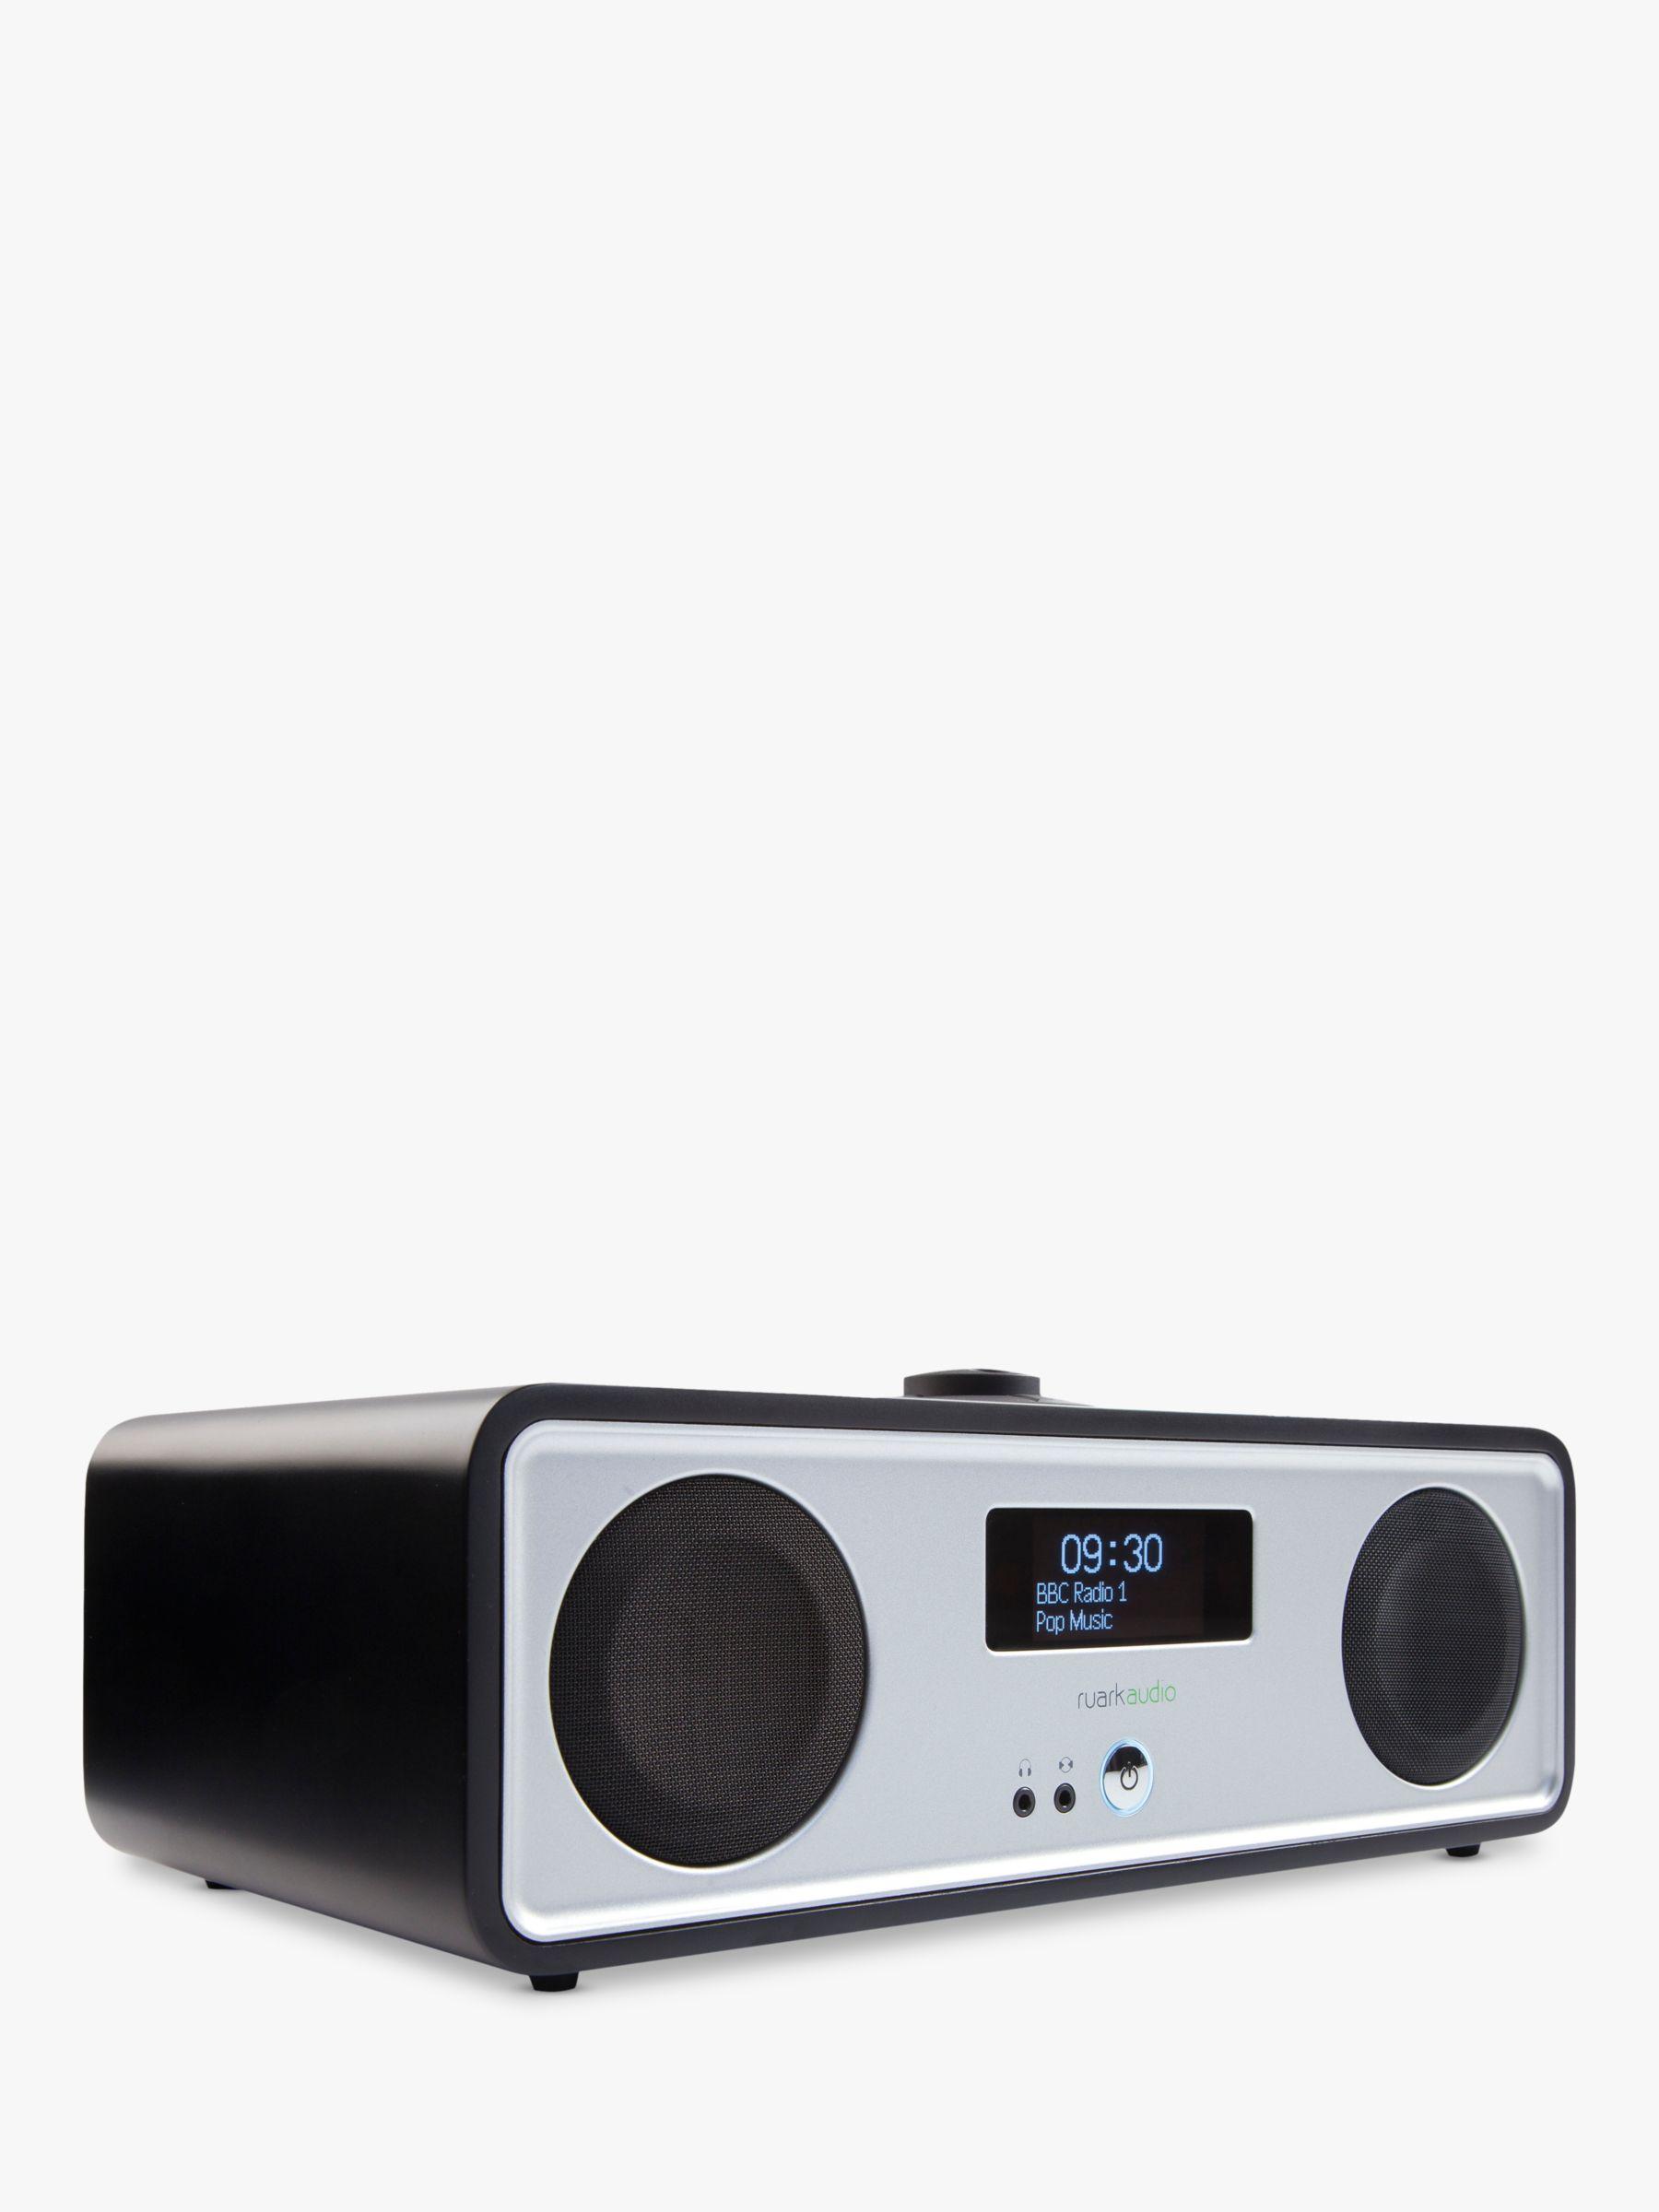 Ruark Audio Ruark R2 MK3 DAB/FM/Internet Radio with Wi-Fi and Bluetooth